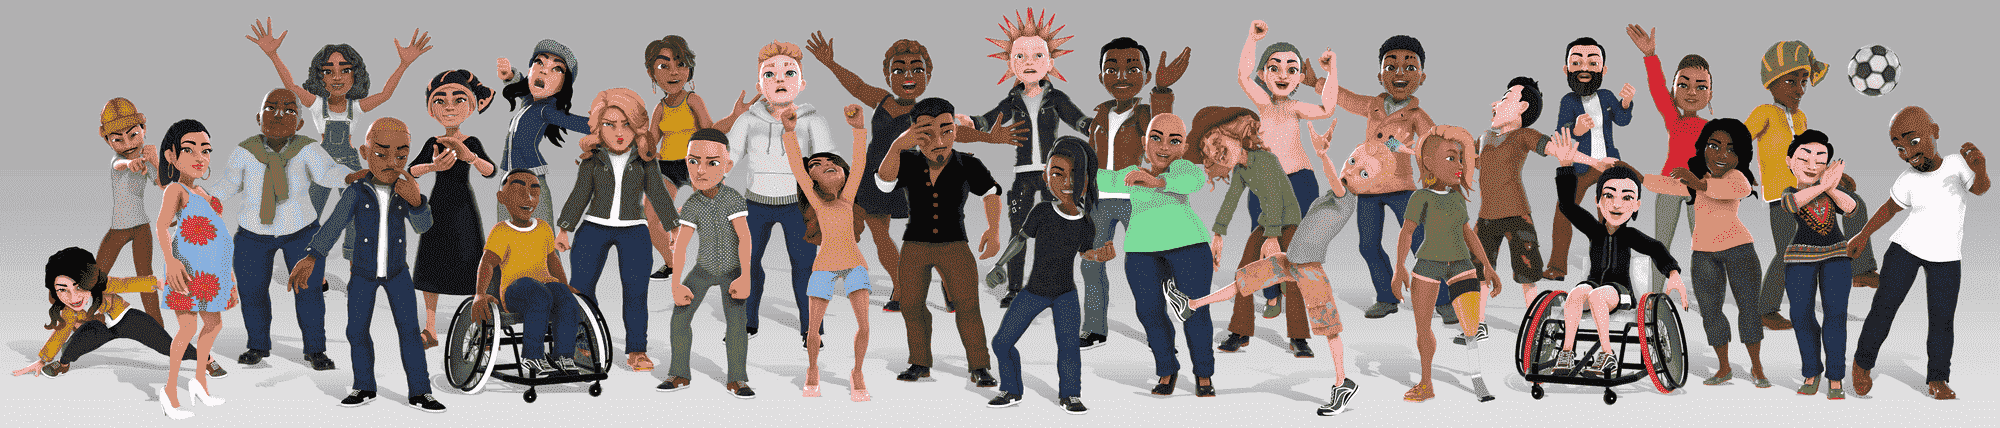 Meet the Xbox Insider Team as Avatars 2018_0618_avatar_lineup.png